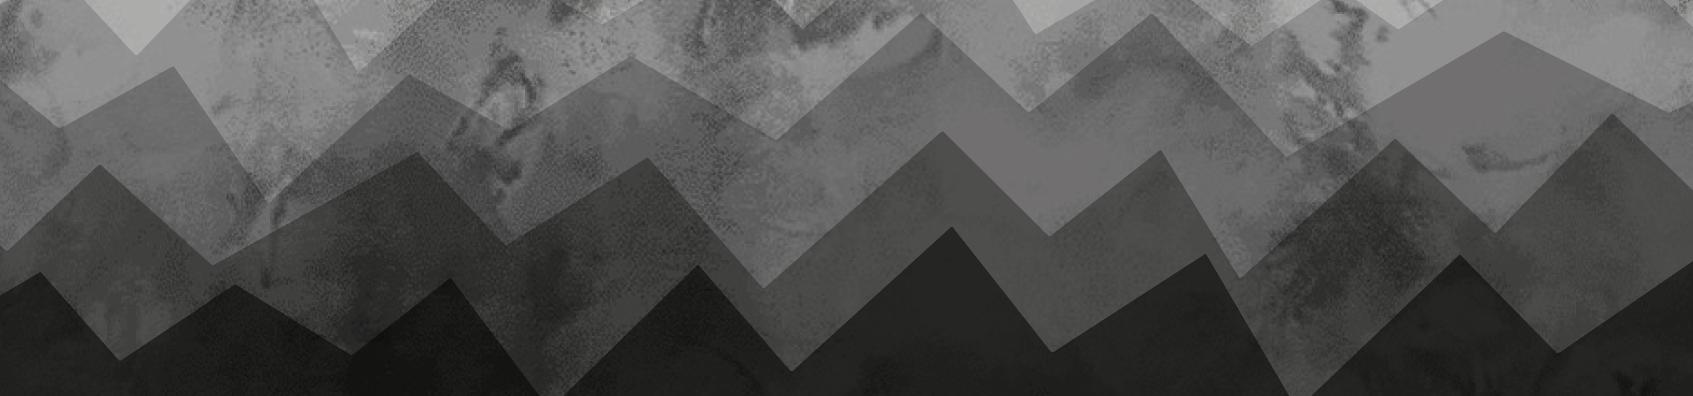 DIBS Website Main Banner 5.png